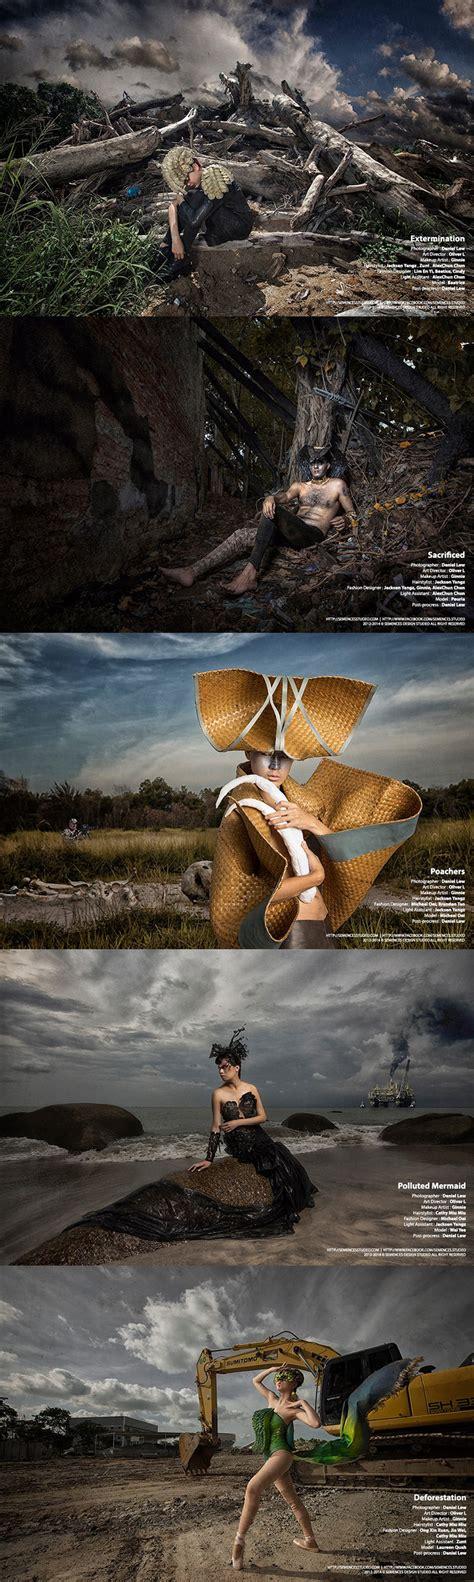 Daniel Low s photo portfolio   0 albums and 5 photos ...